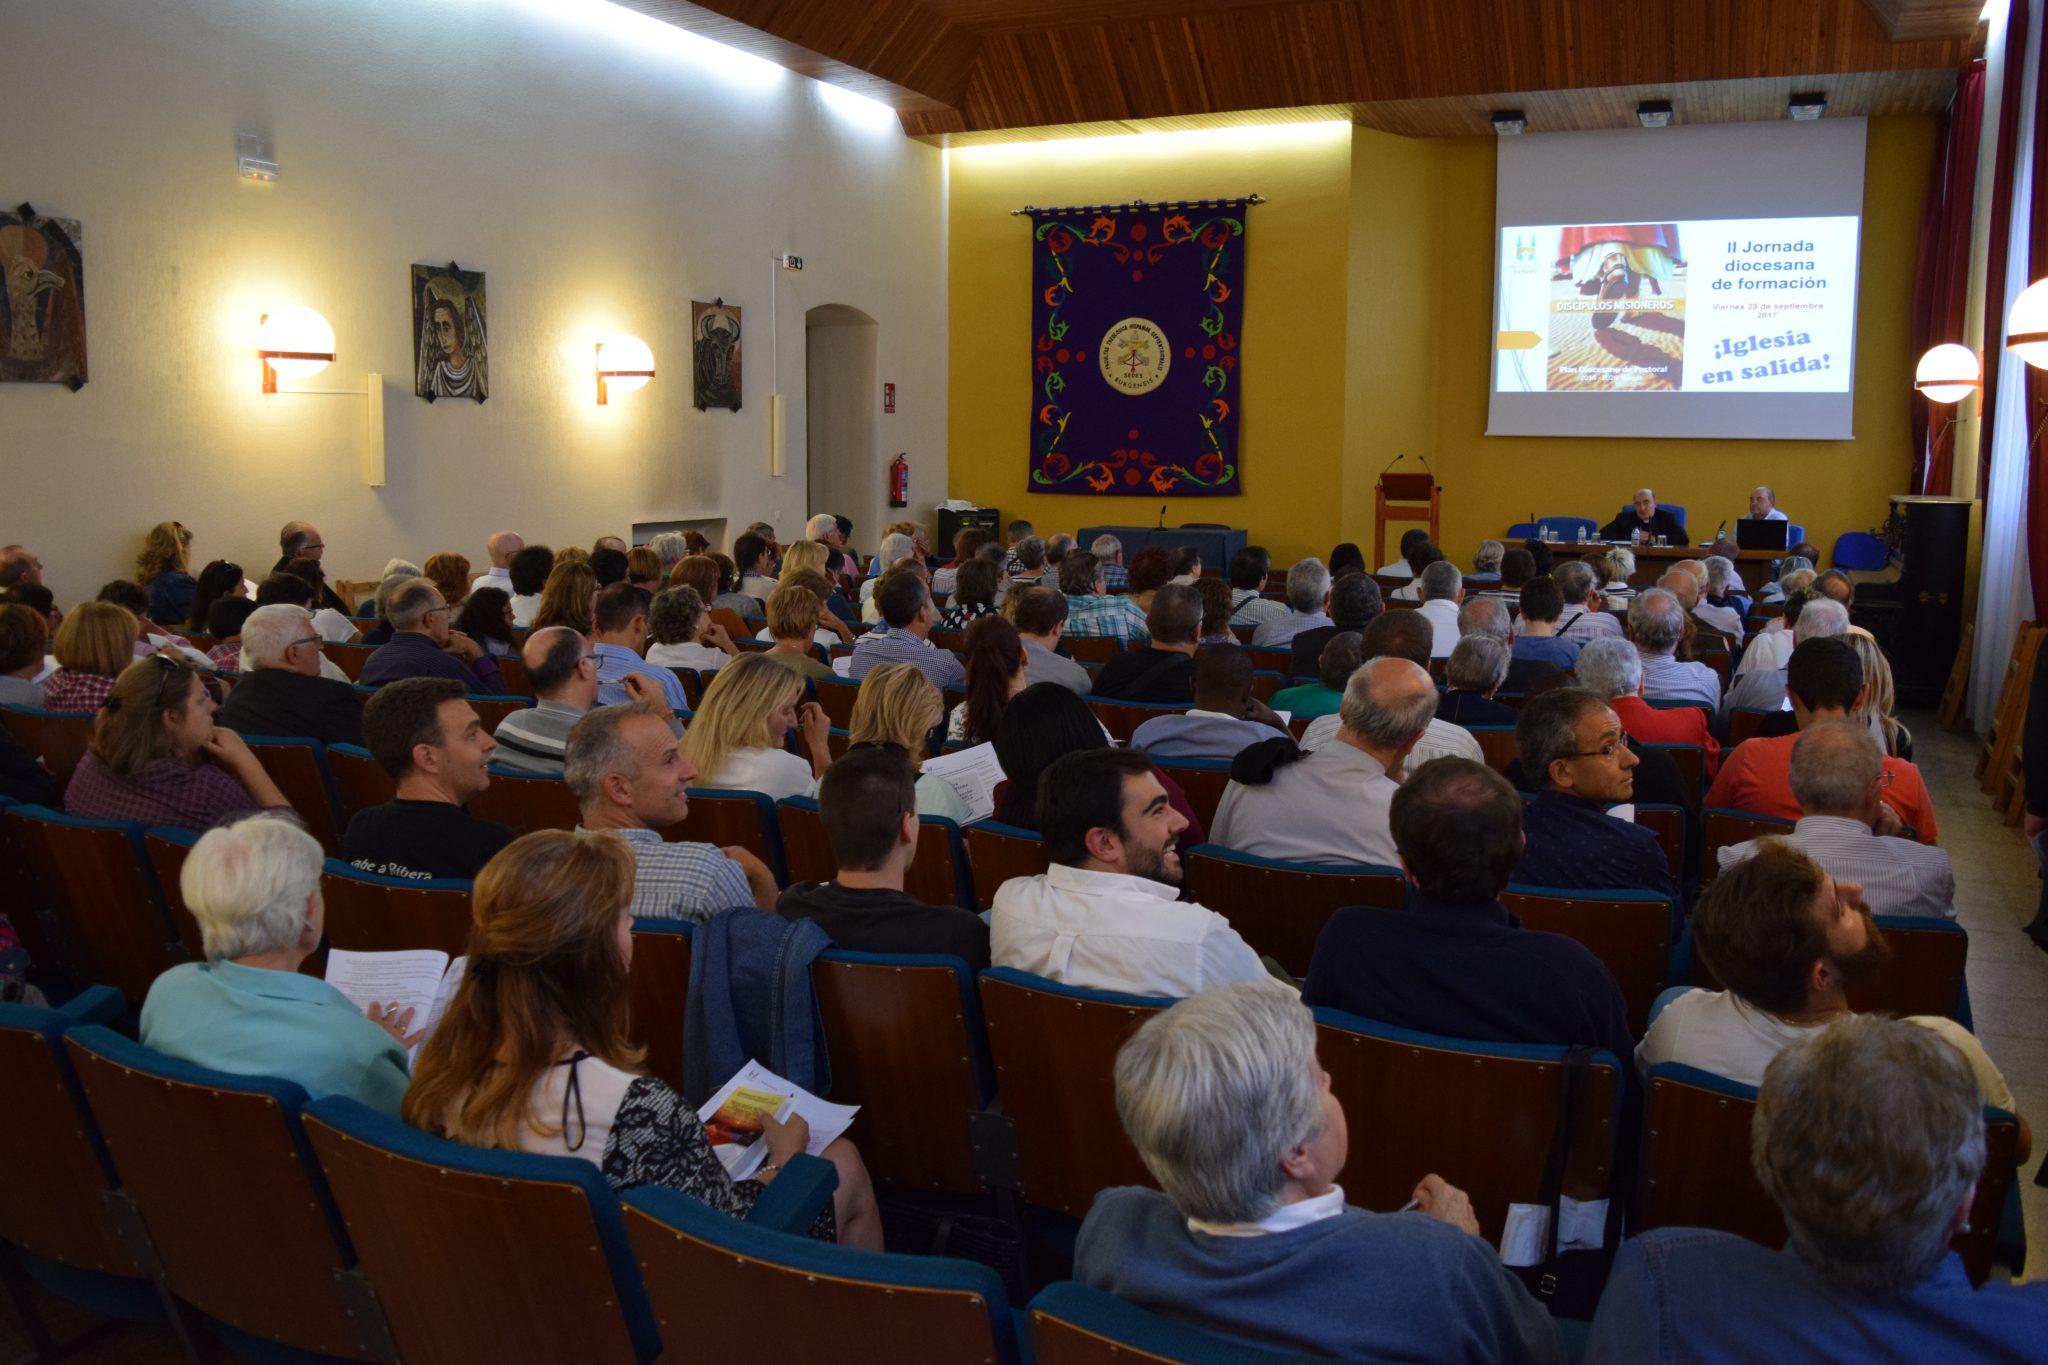 jornada diocesana formacion_0602